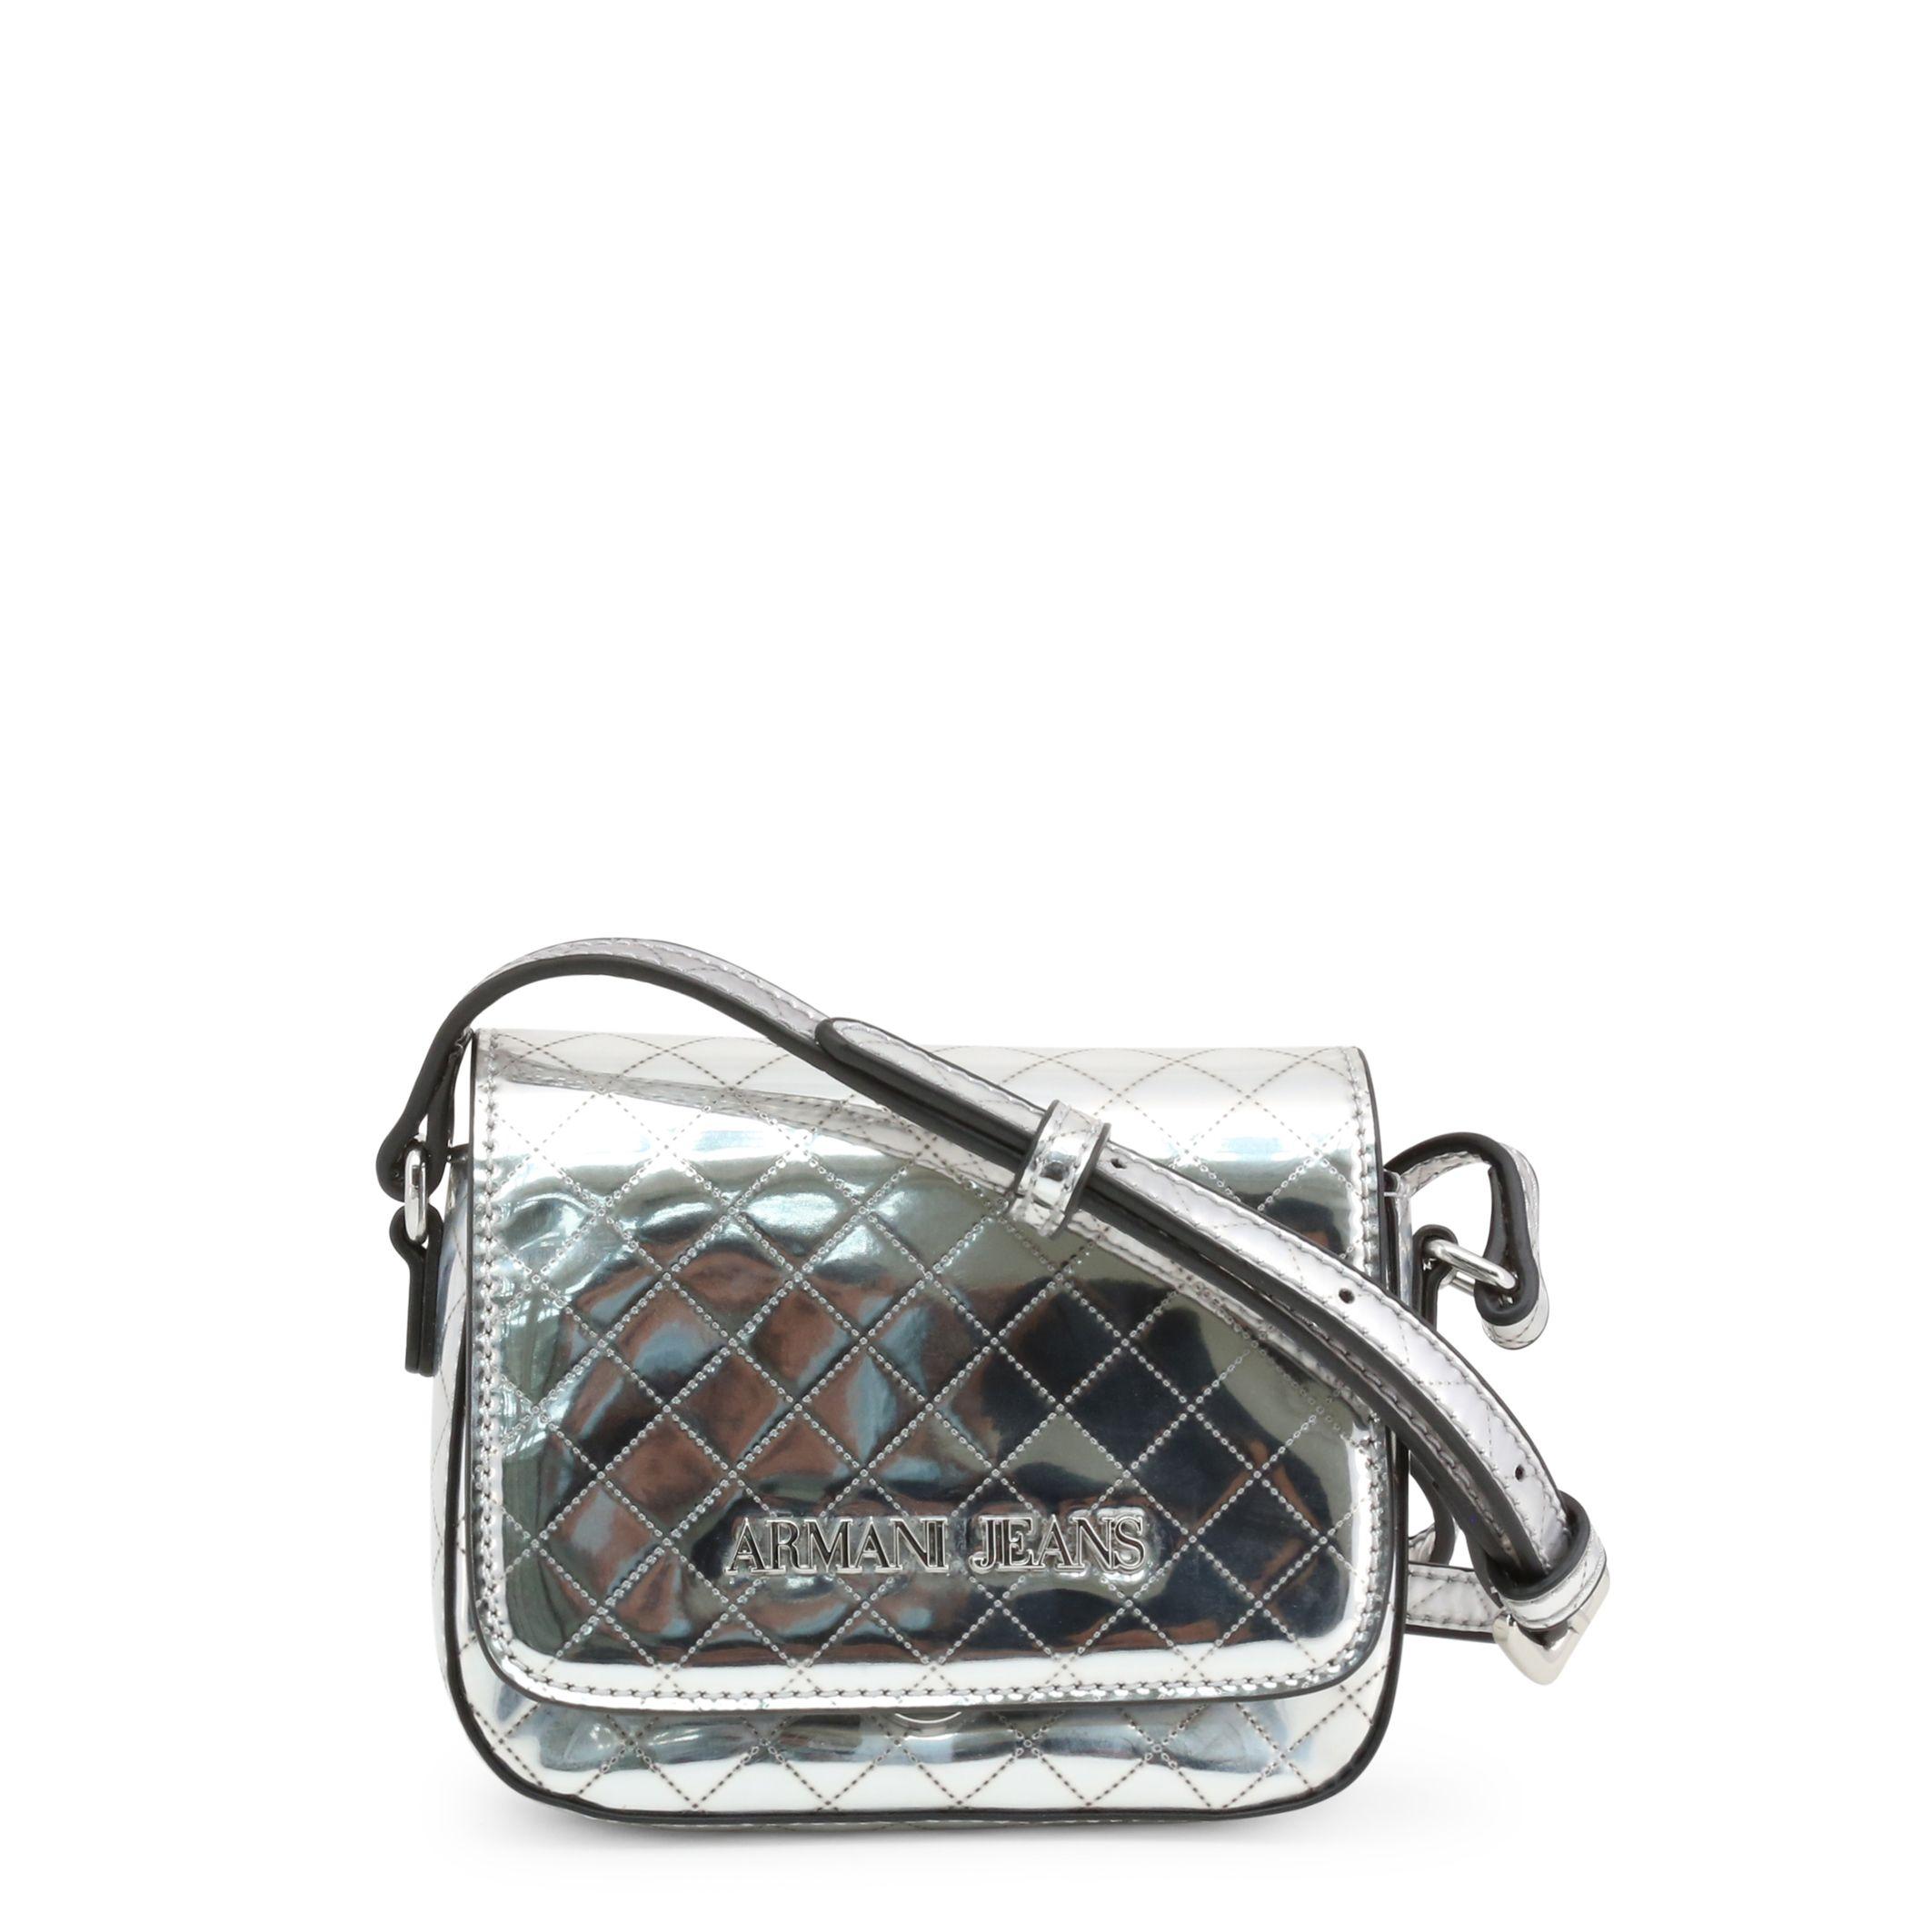 Shoulder bag Armani Jeans 922219_7P775